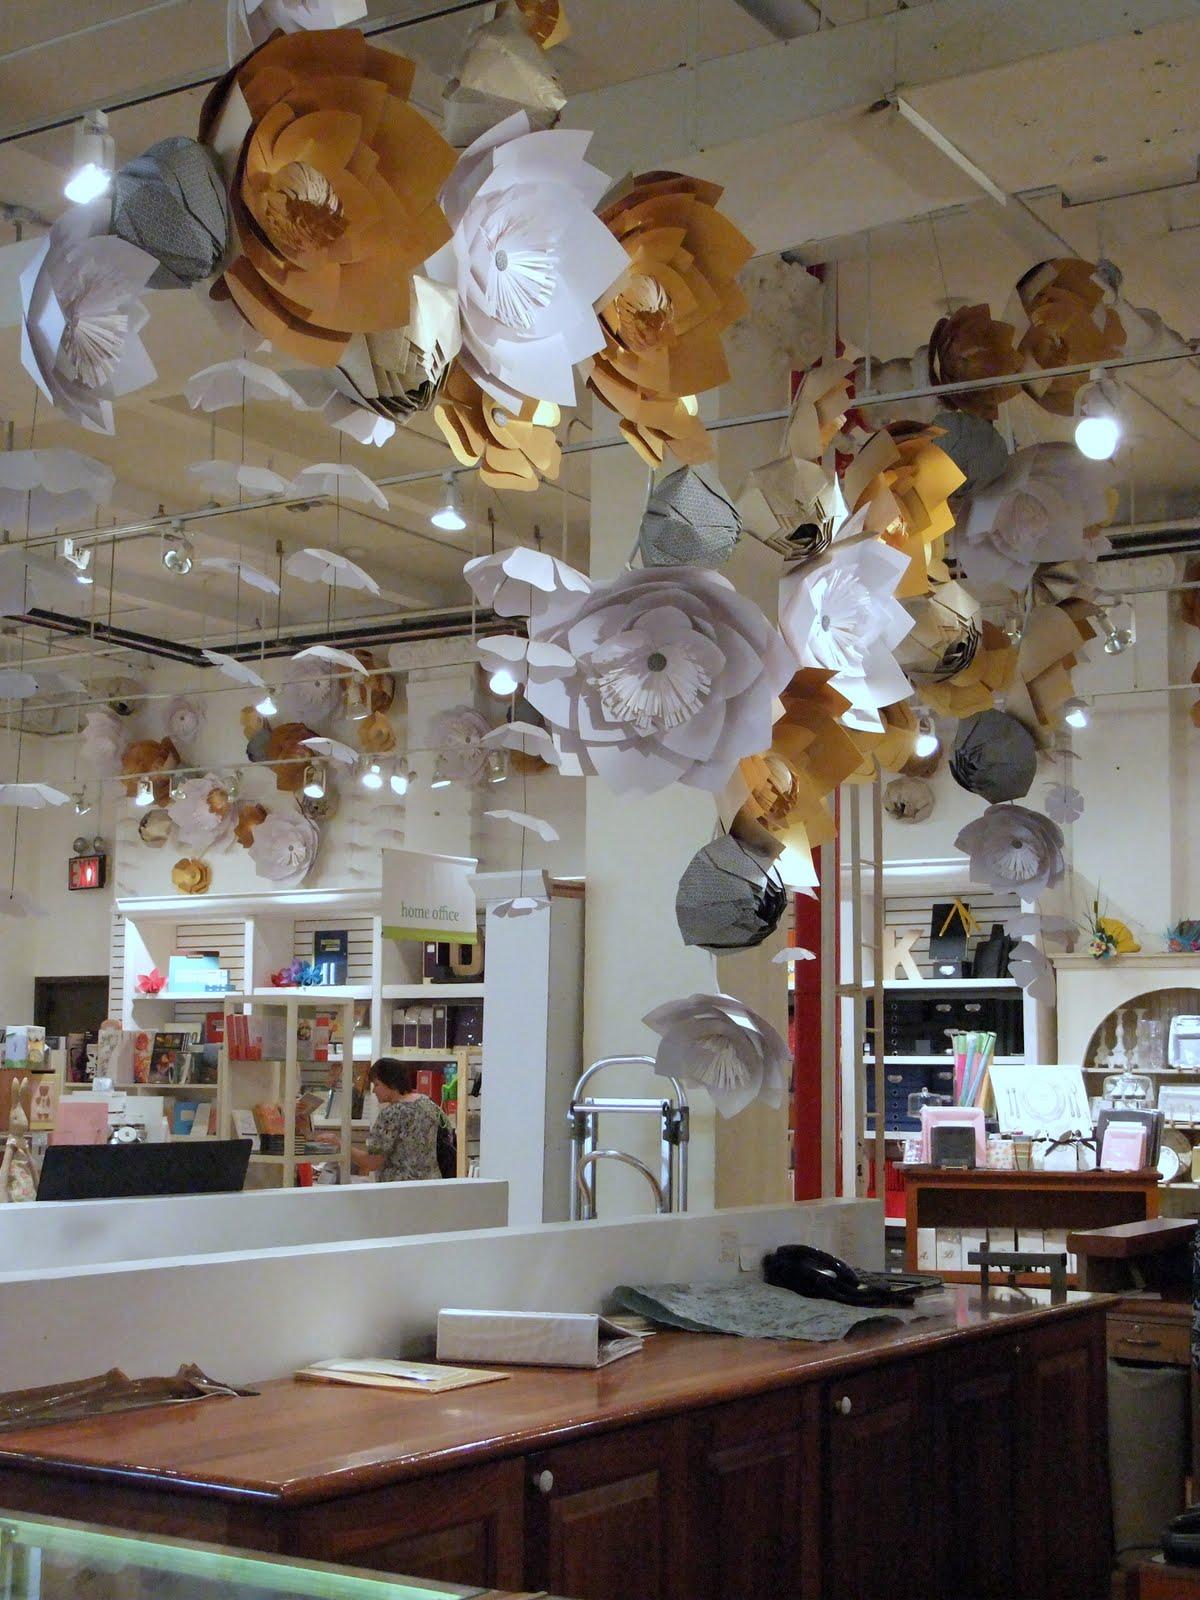 Cavania Inspirational Stores  Display Ideas